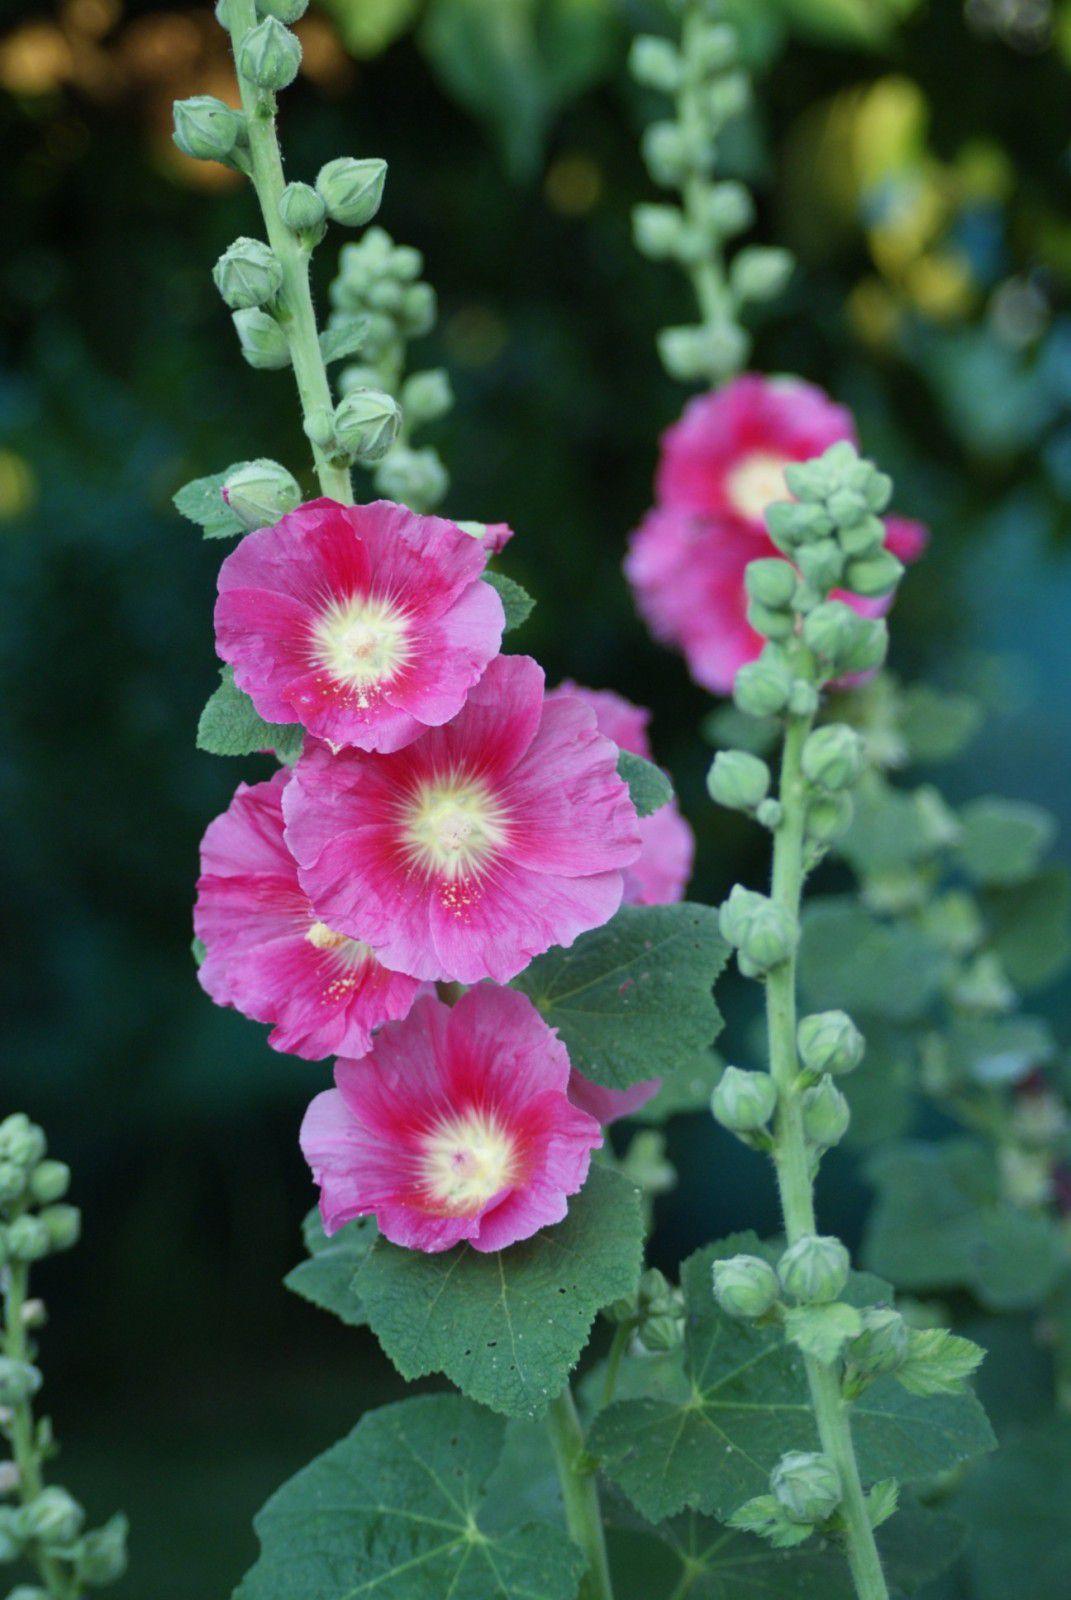 Album - Fleurs et jardins